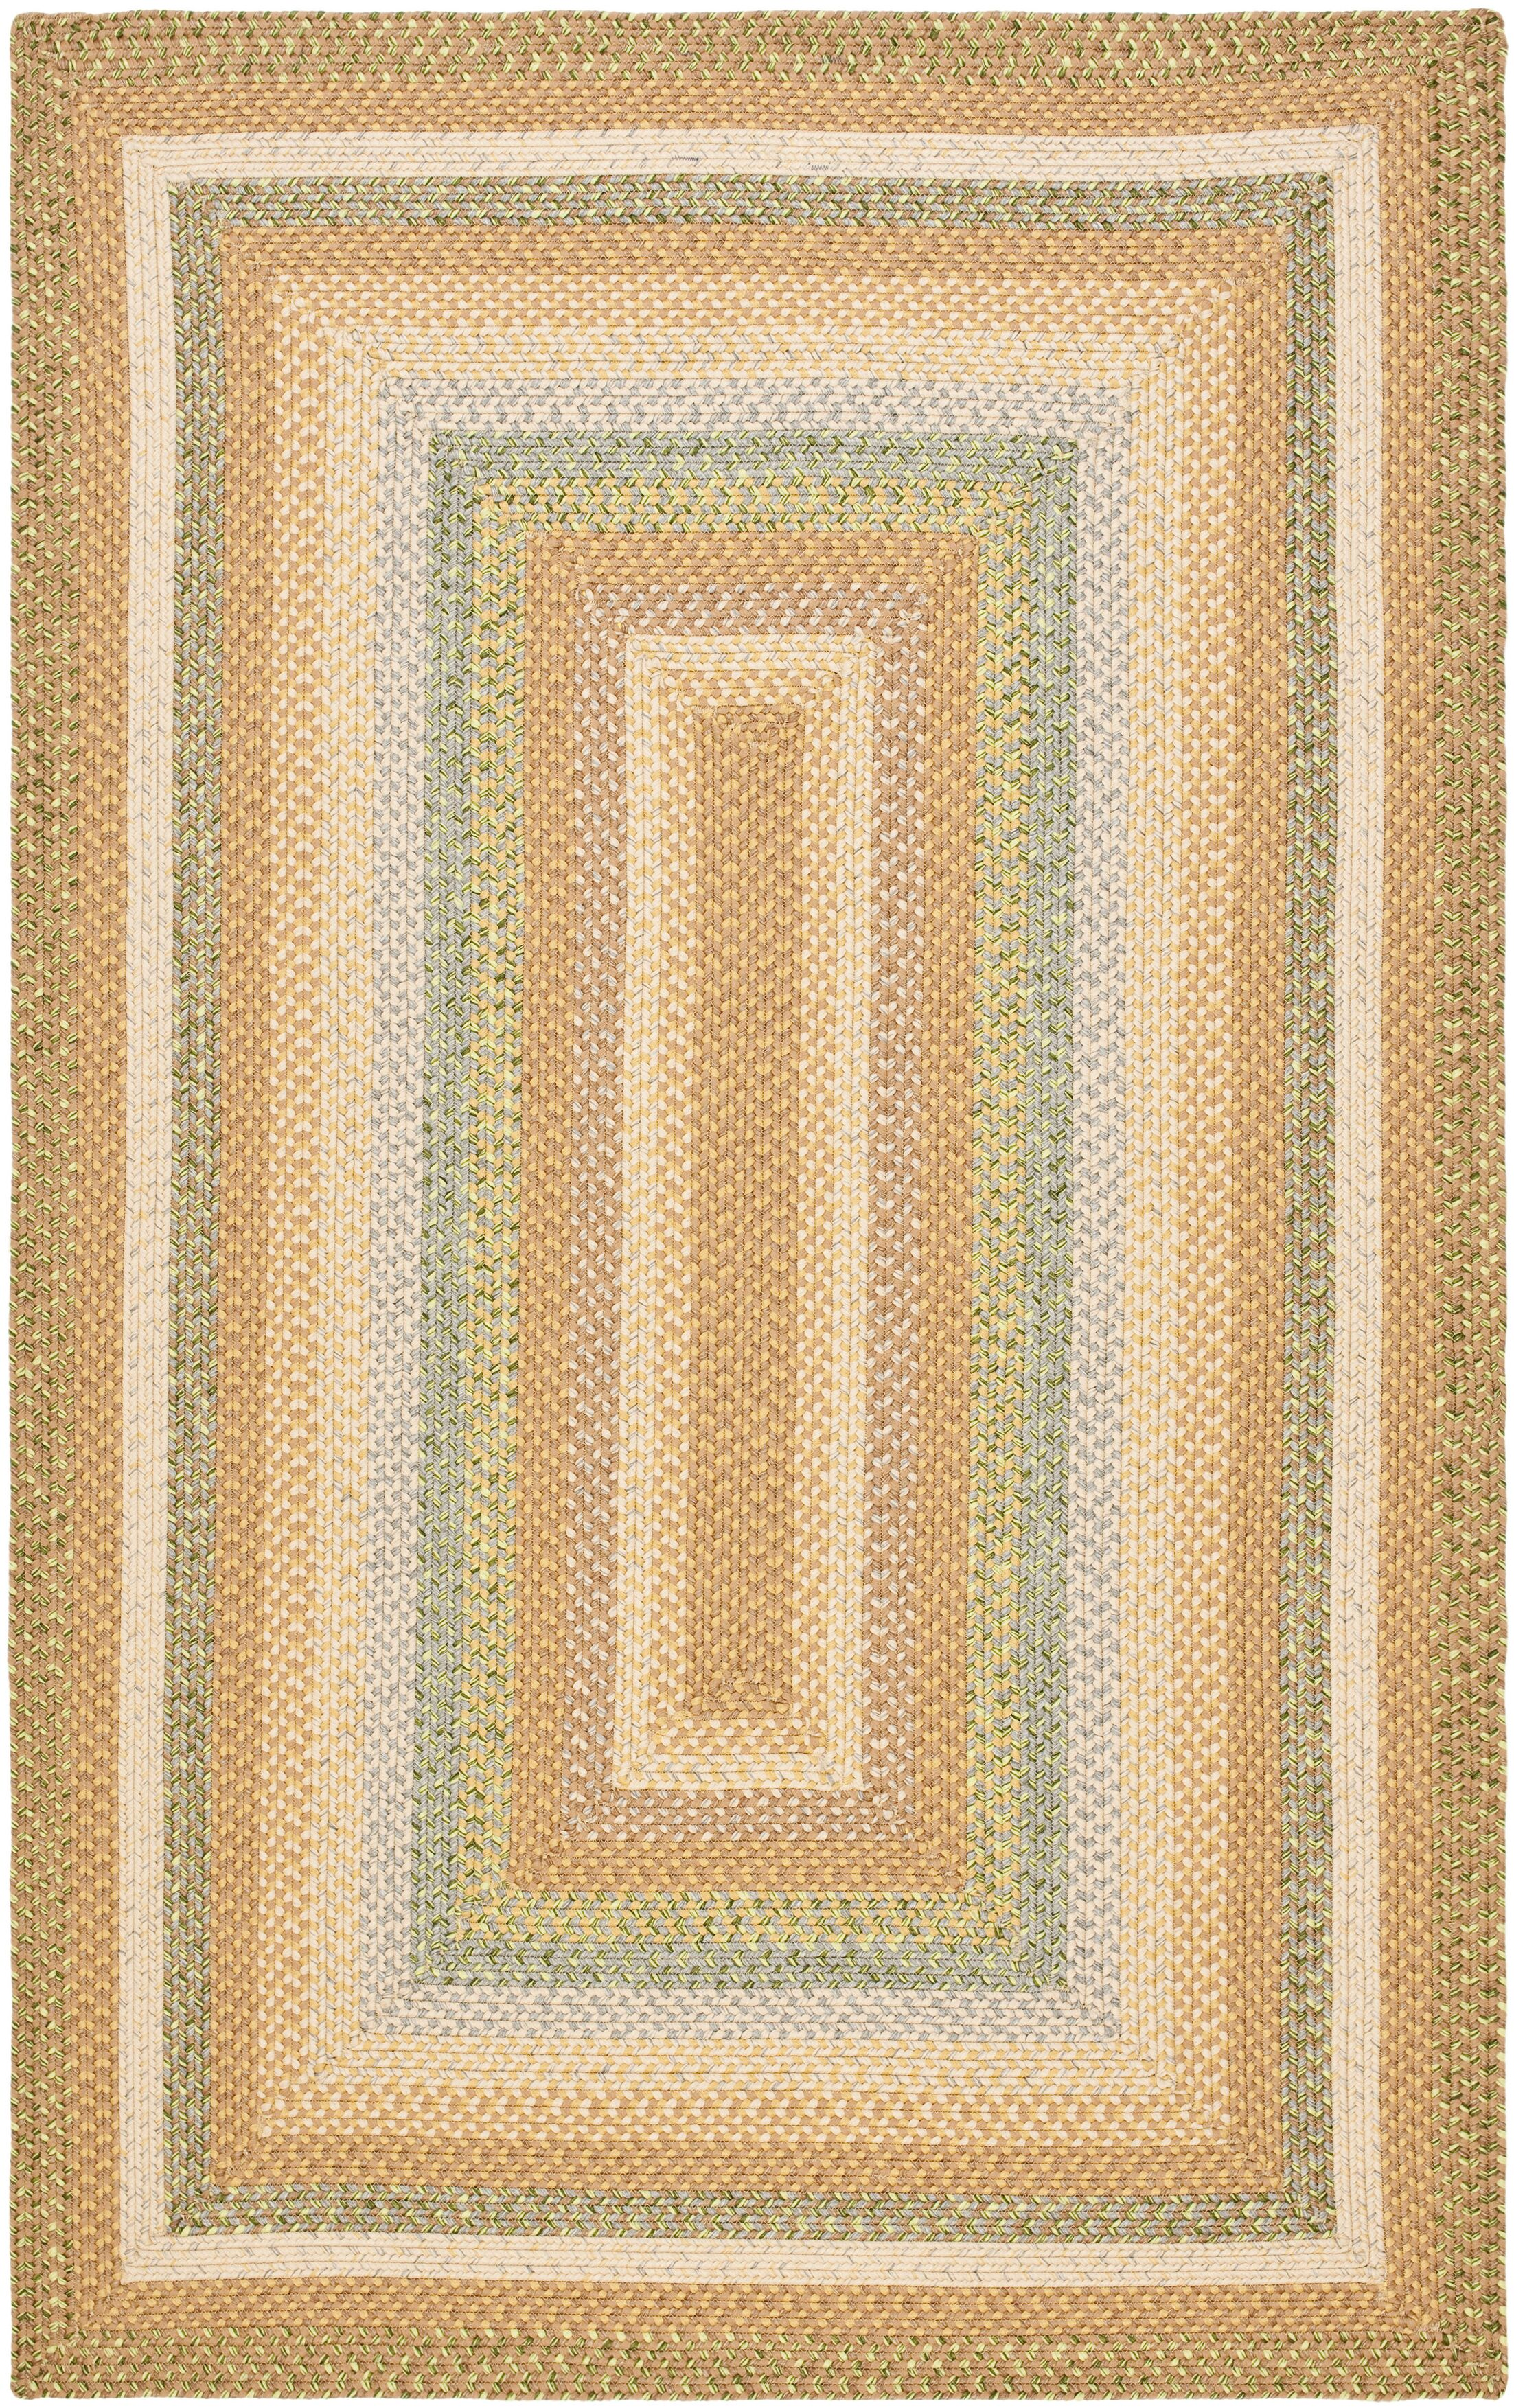 Georgina Tan/Multi Area Rug Rug Size: Rectangle 8' x 10'